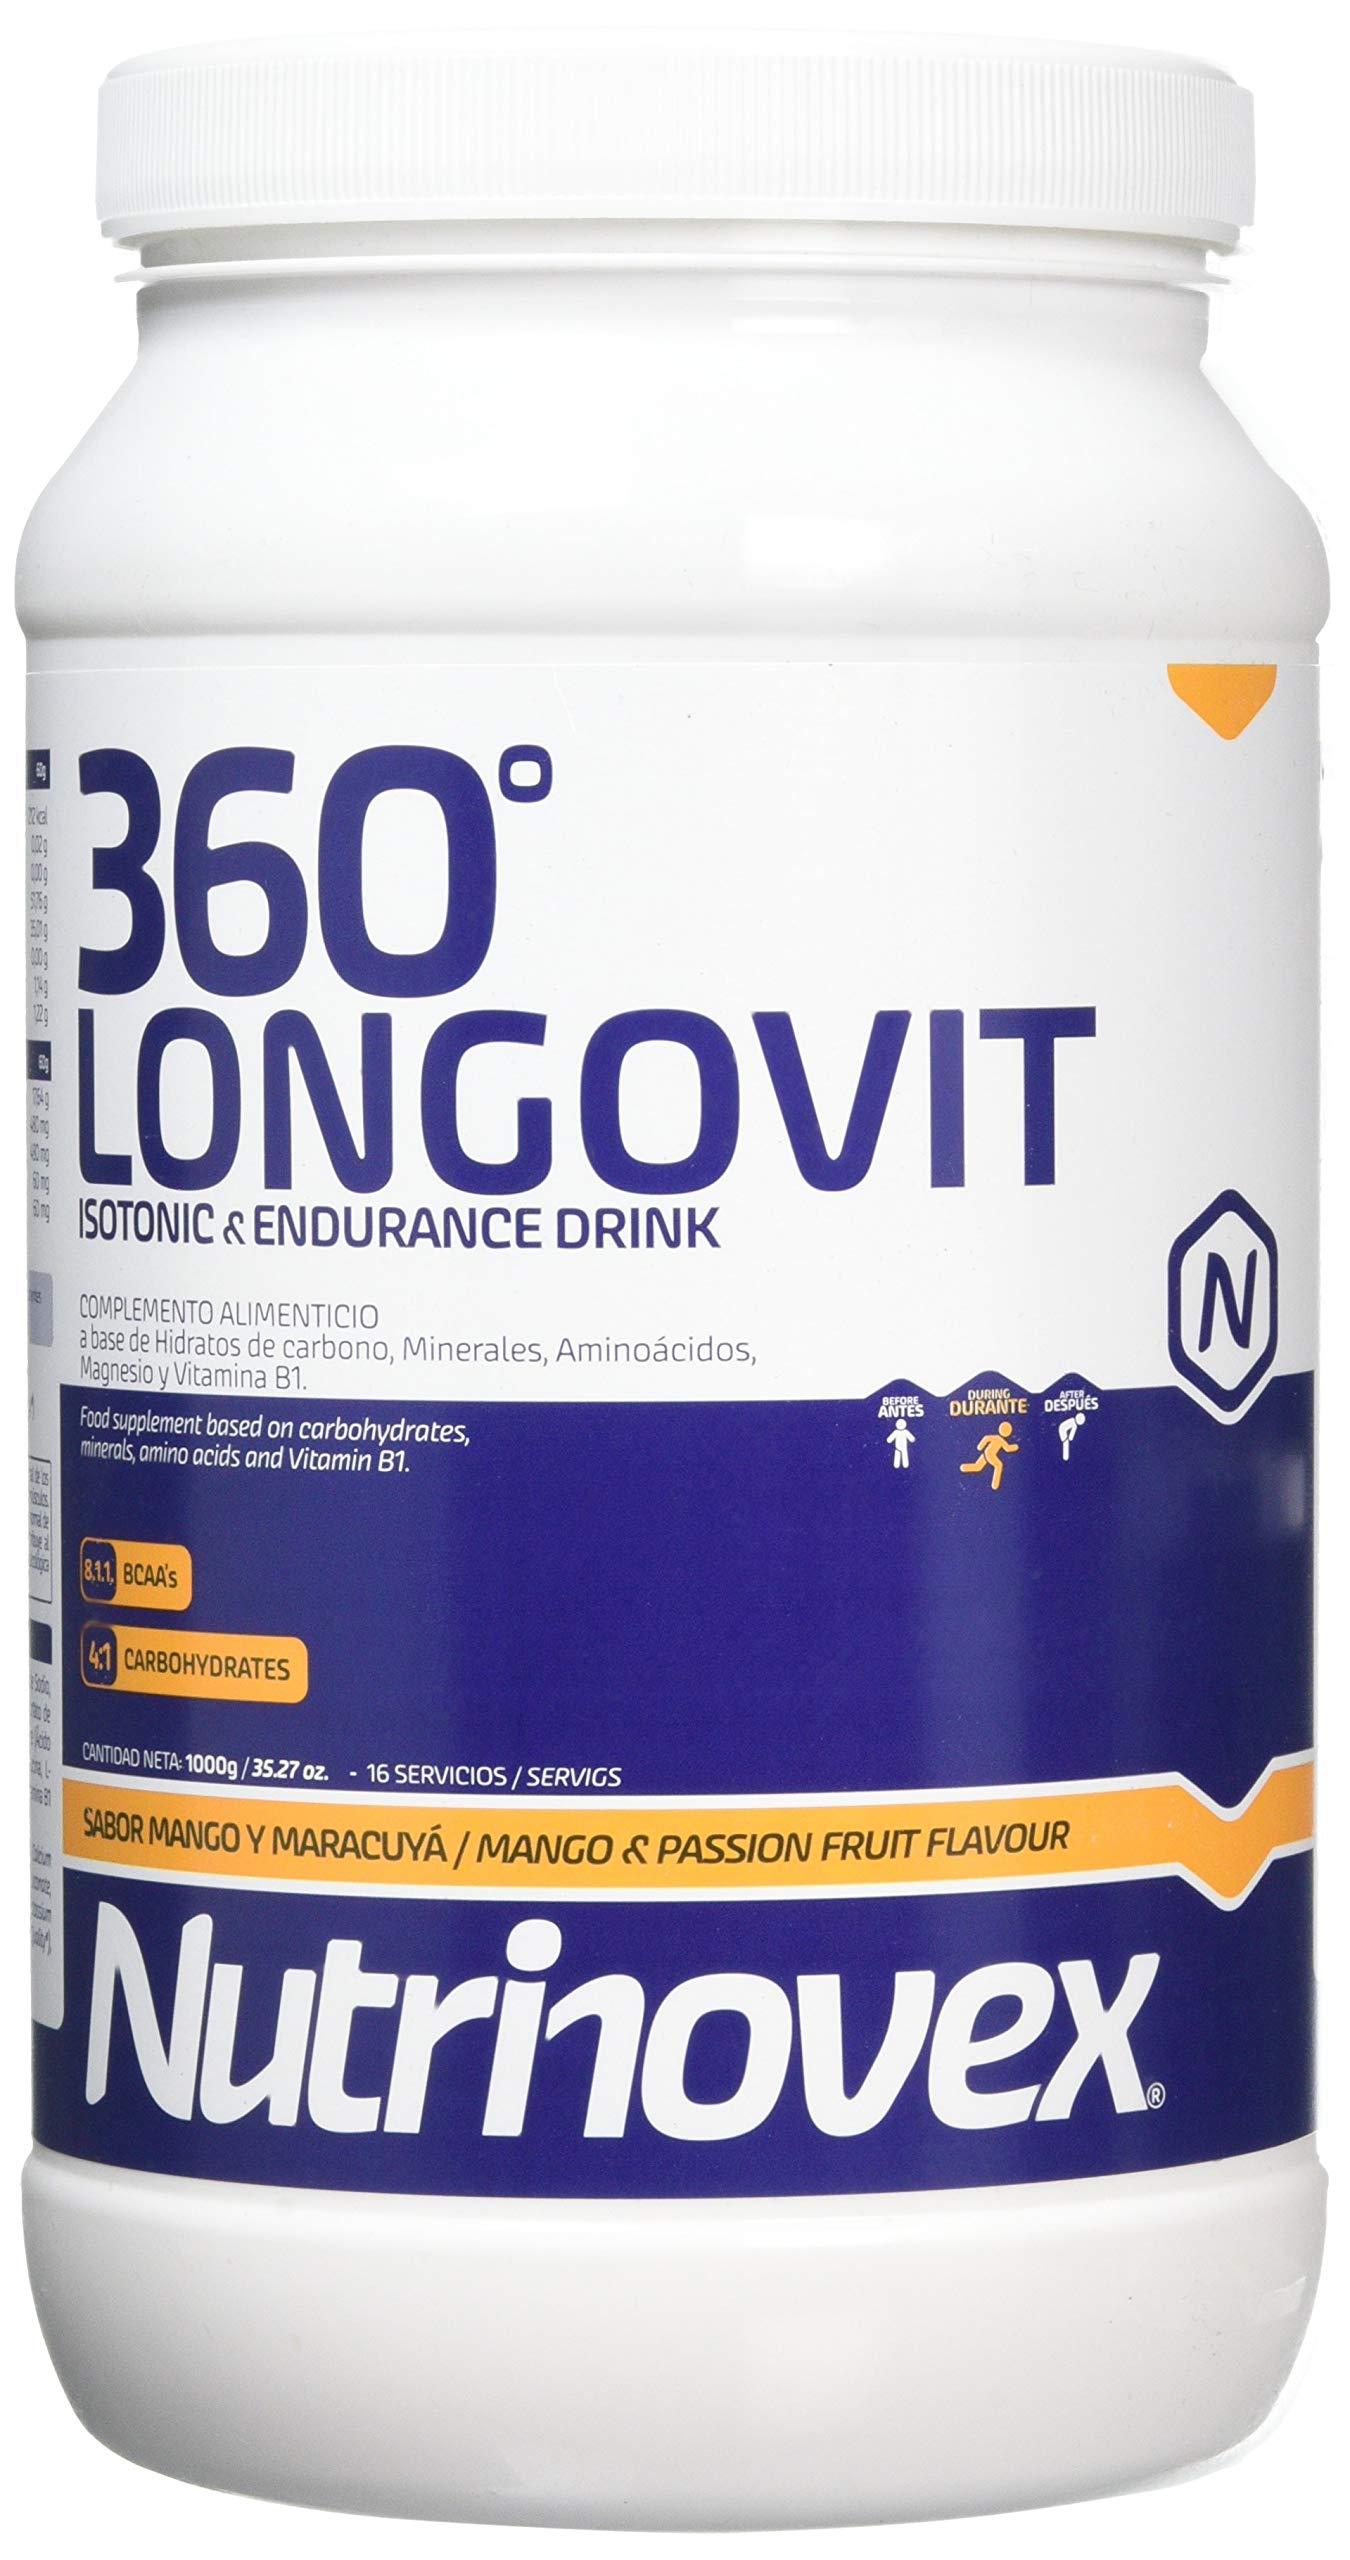 Nutrinovex bebida energética e isotónica 360º Longovit, Sabor Mango y maracuyá - 1000 gr product